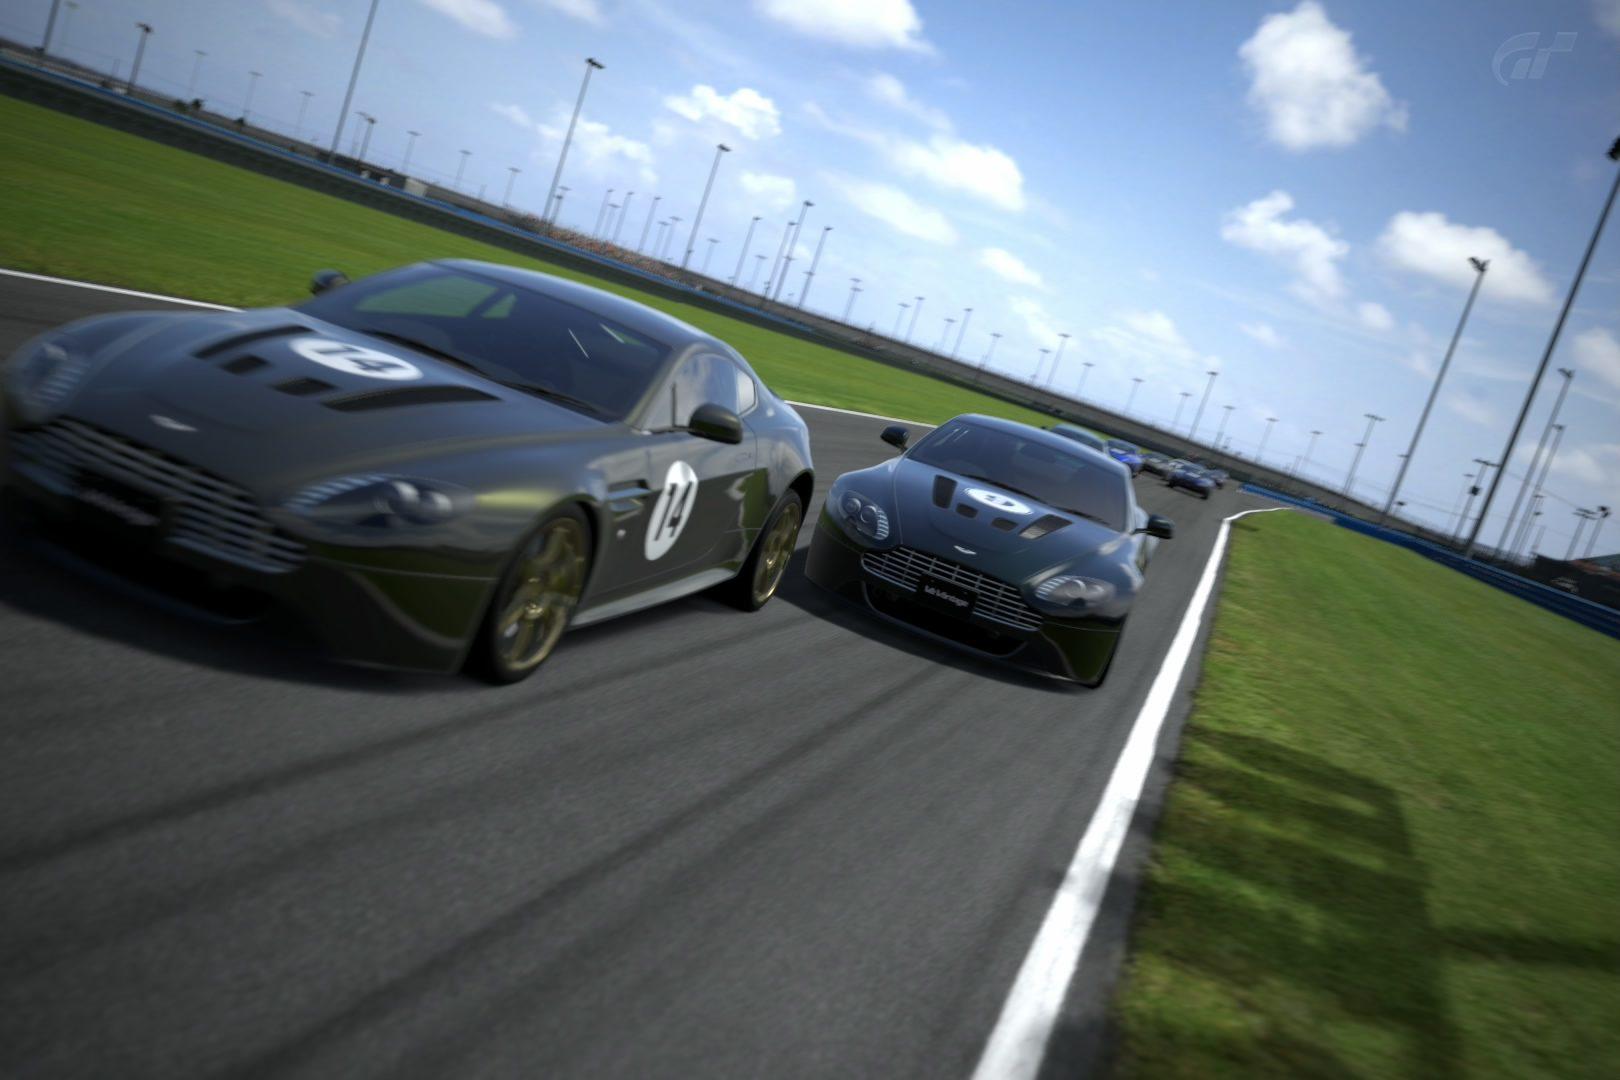 Daytona Road Course_9.jpg